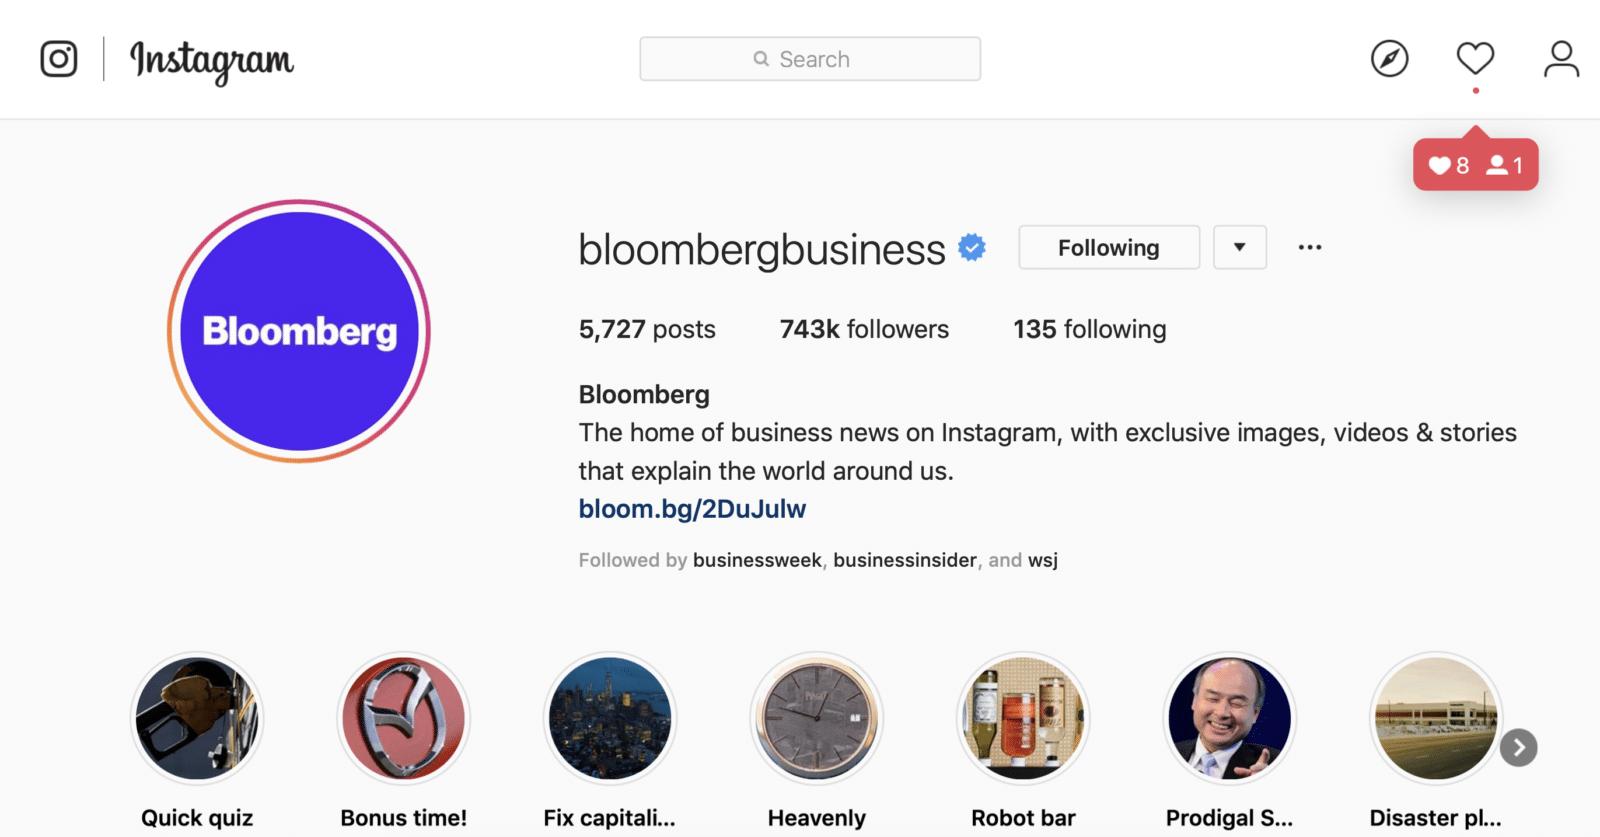 Bloomberg แนะนำ 5 เคล็ดลับทำ Instagram ยังไงให้ปัง ใช้รูป คำคม และ Story